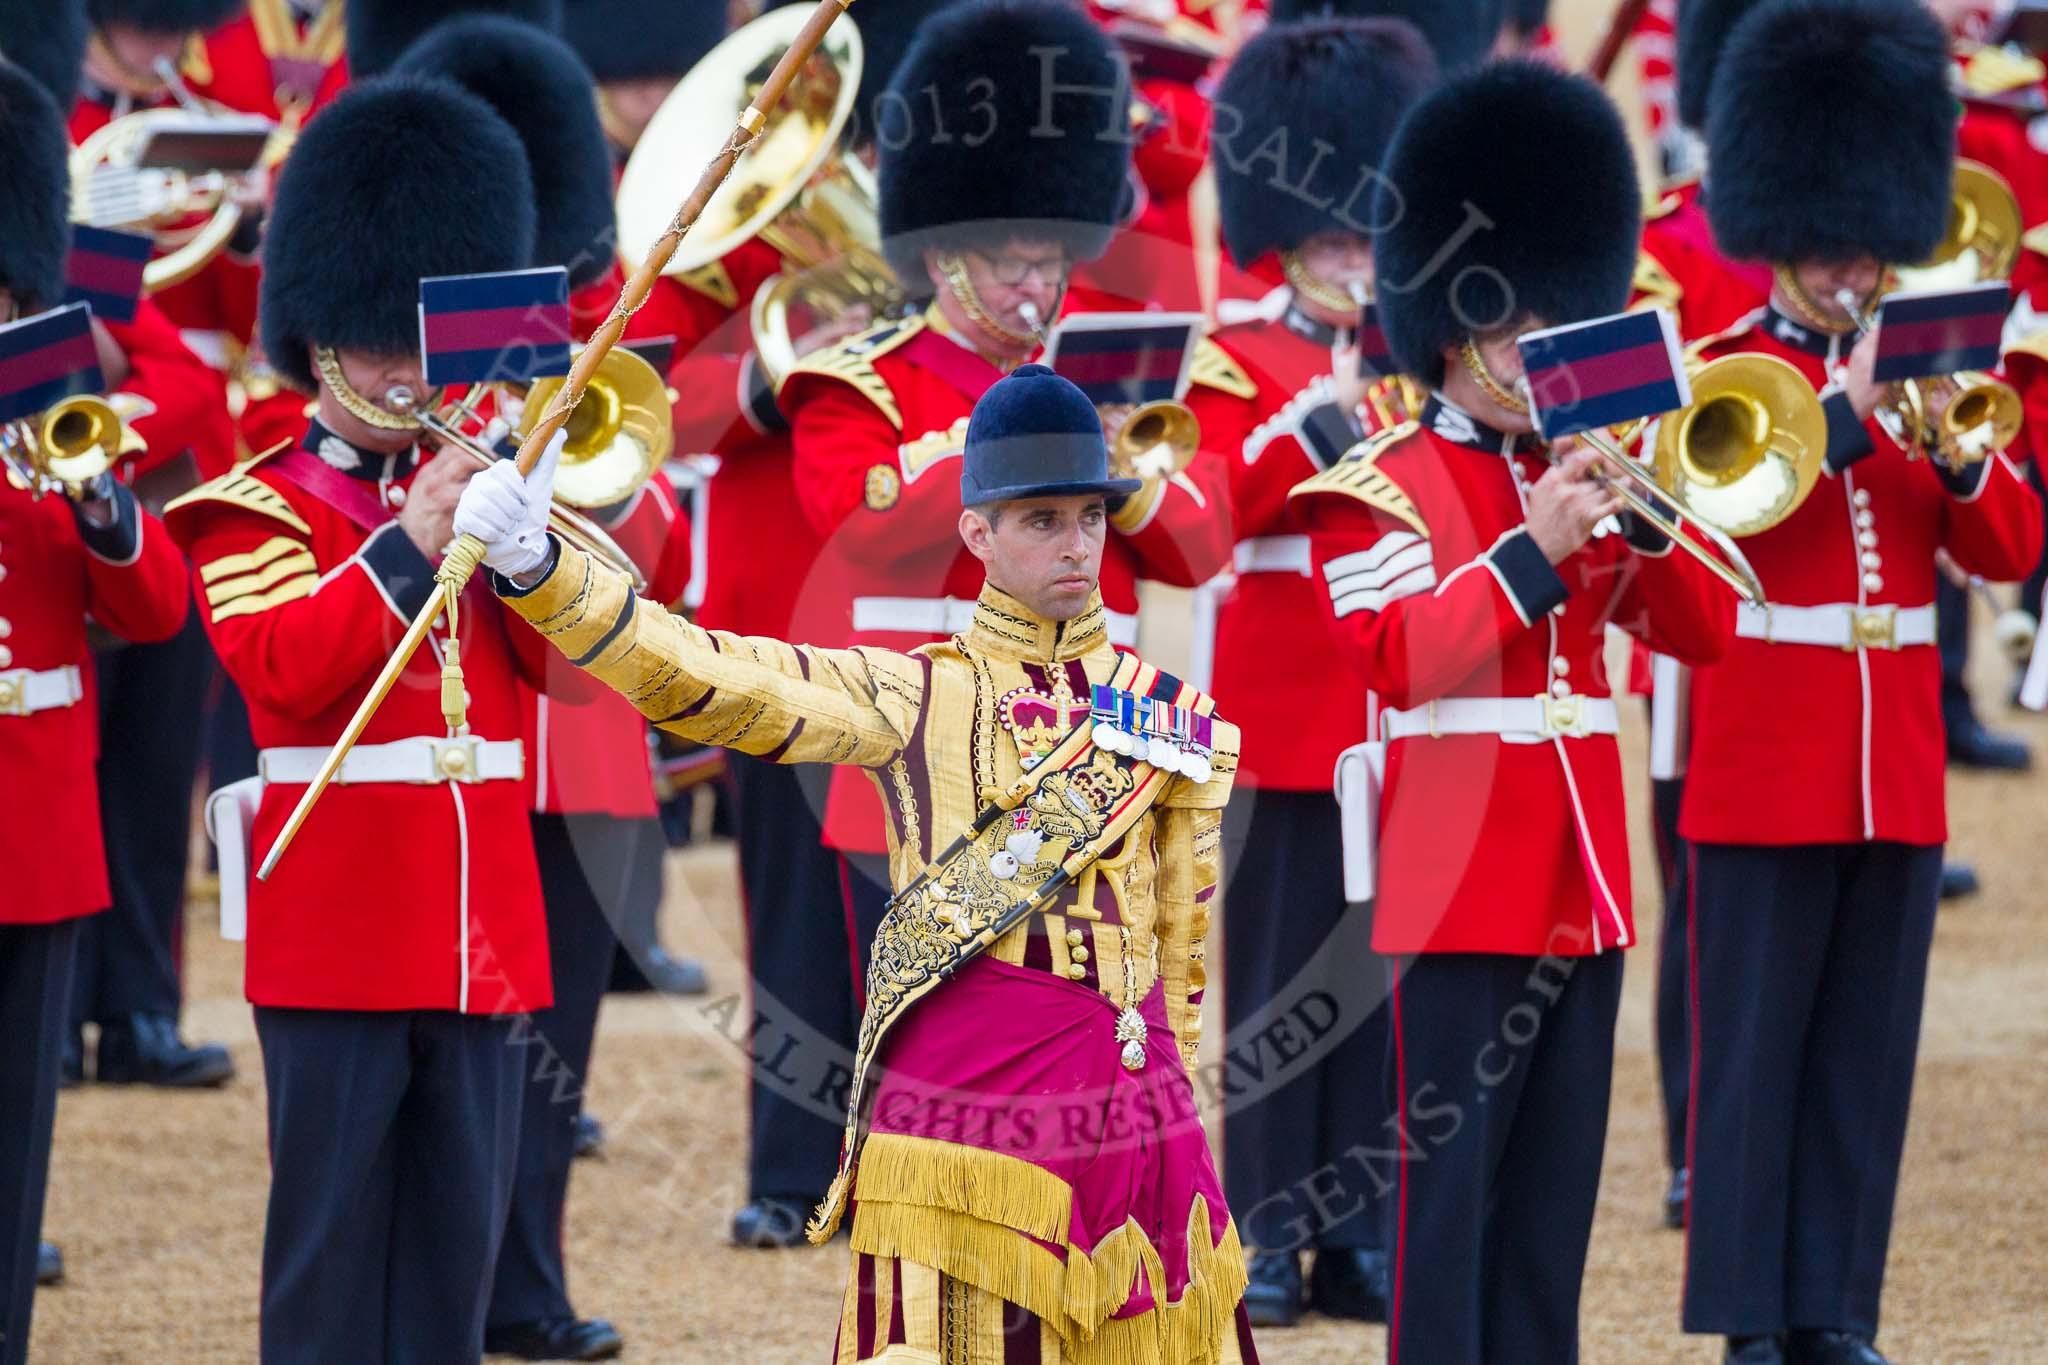 Queen's Birthday Parade 2015 - Trooping the Colour Photos ...